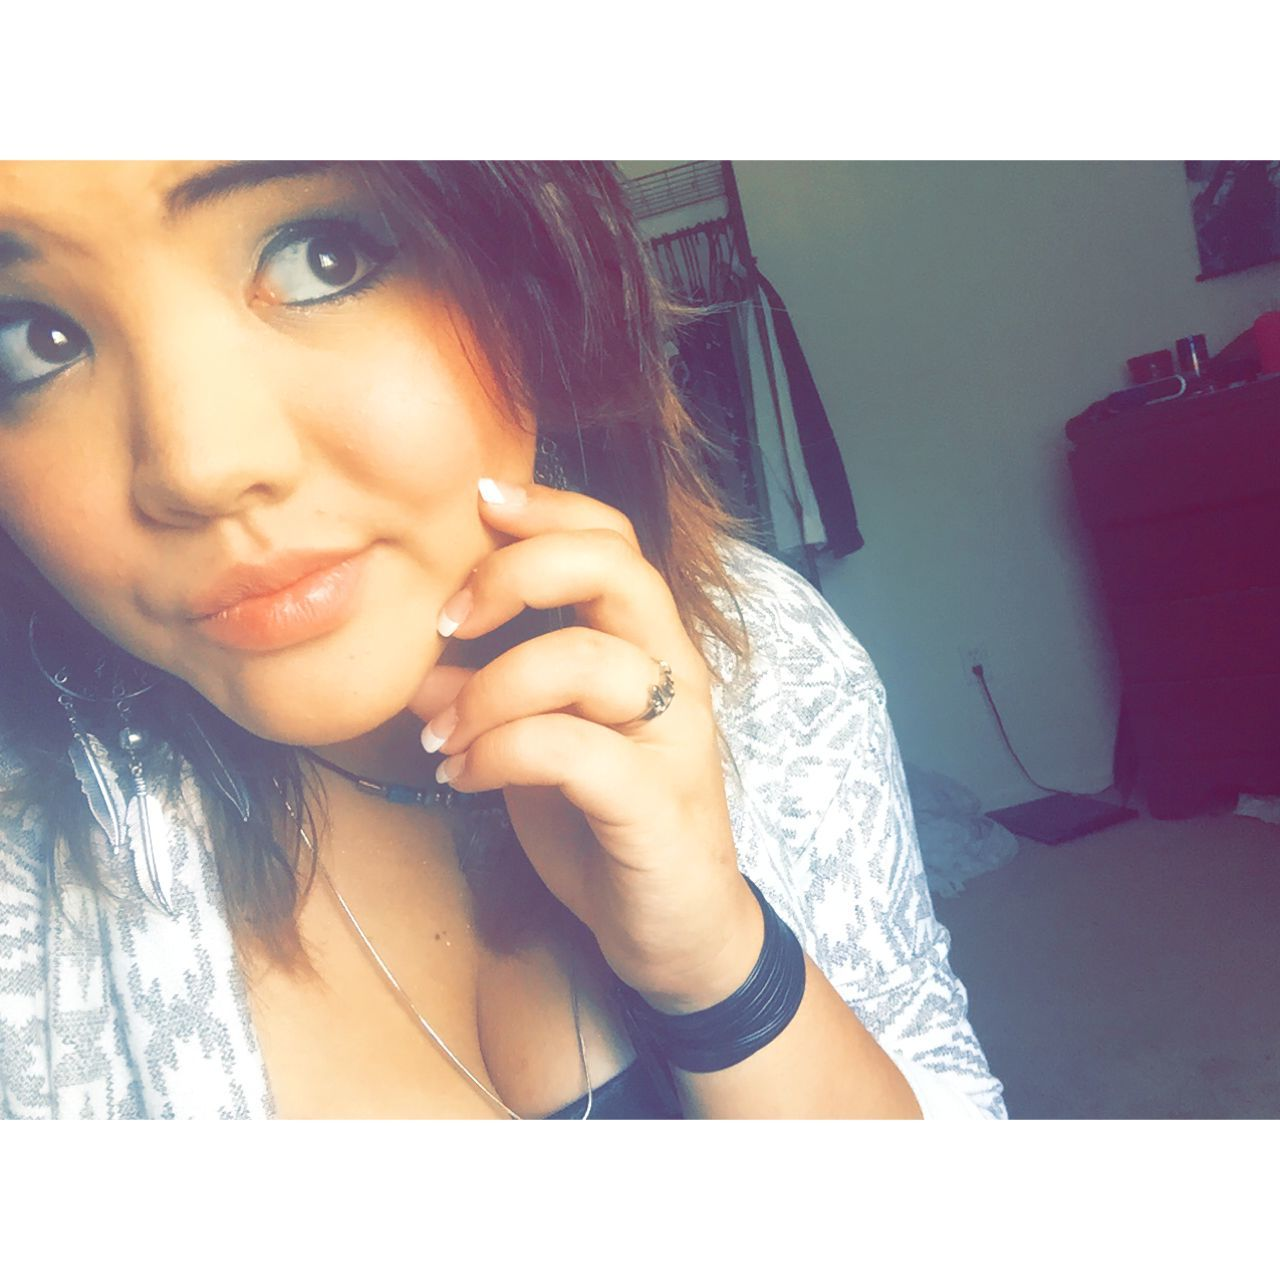 Taking Photos MeMyselfAndI ♡ Selfie ✌ LoveYourSelf ♥ Bored Beyourself